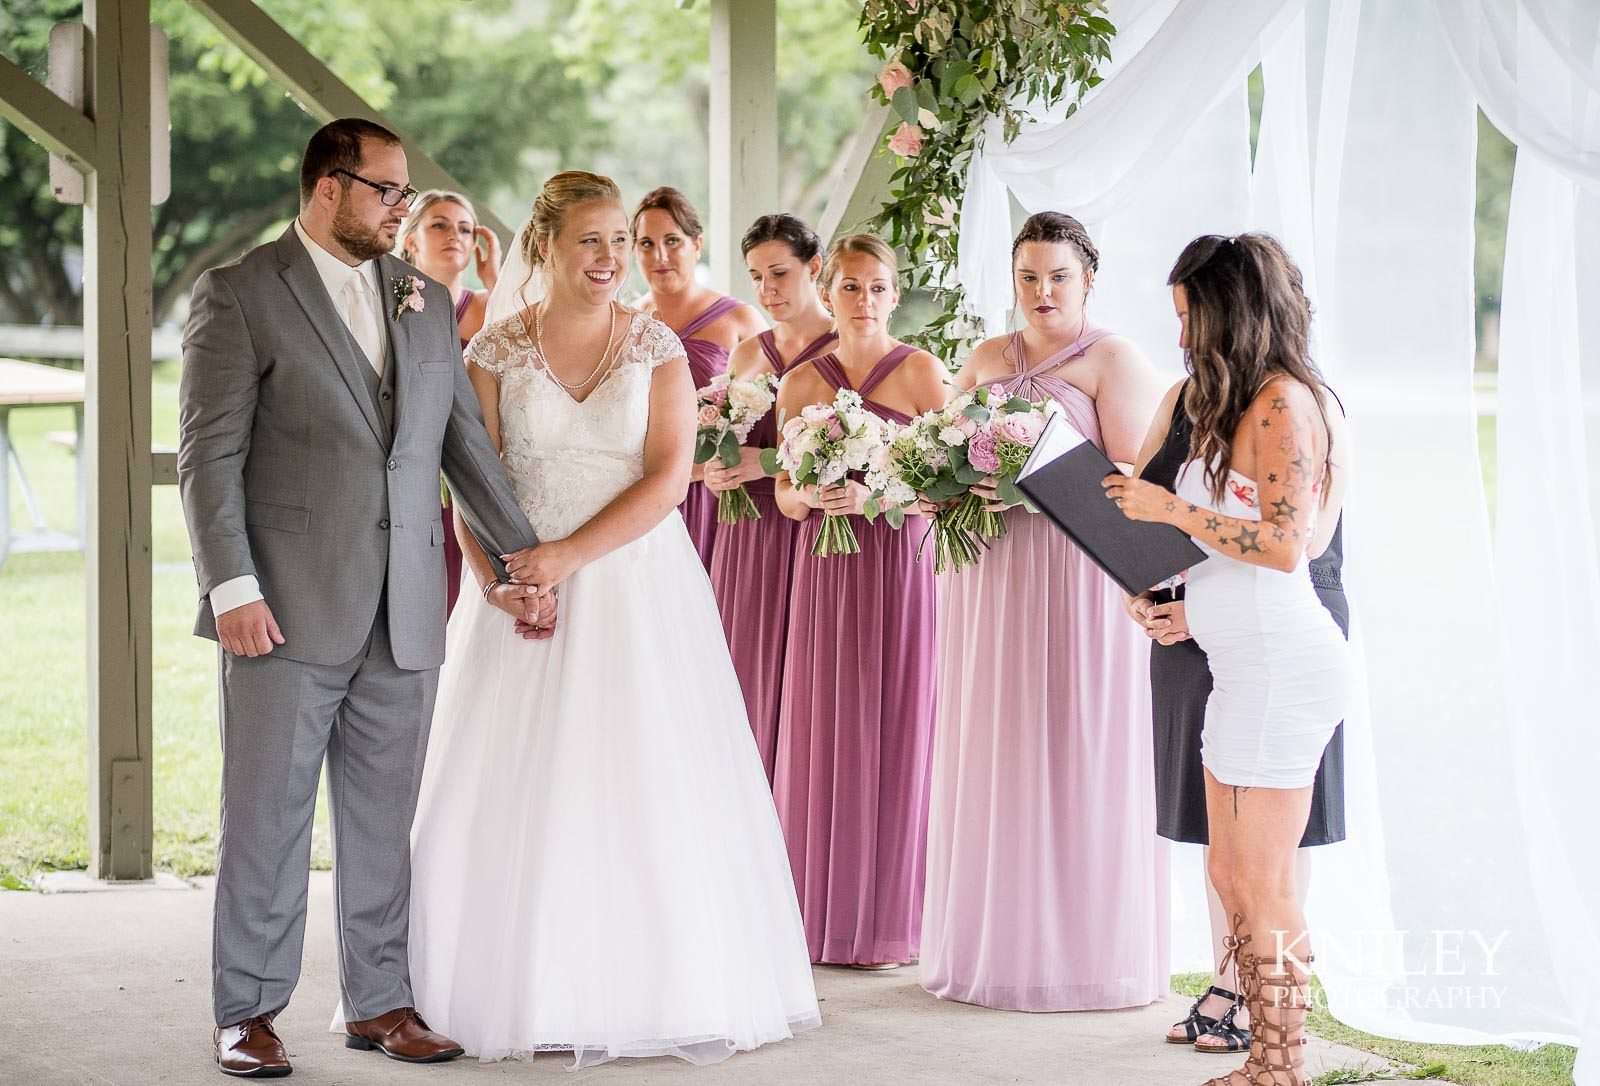 47-Lakefront-Lodge-Webster-NY-Wedding-Photography.jpg